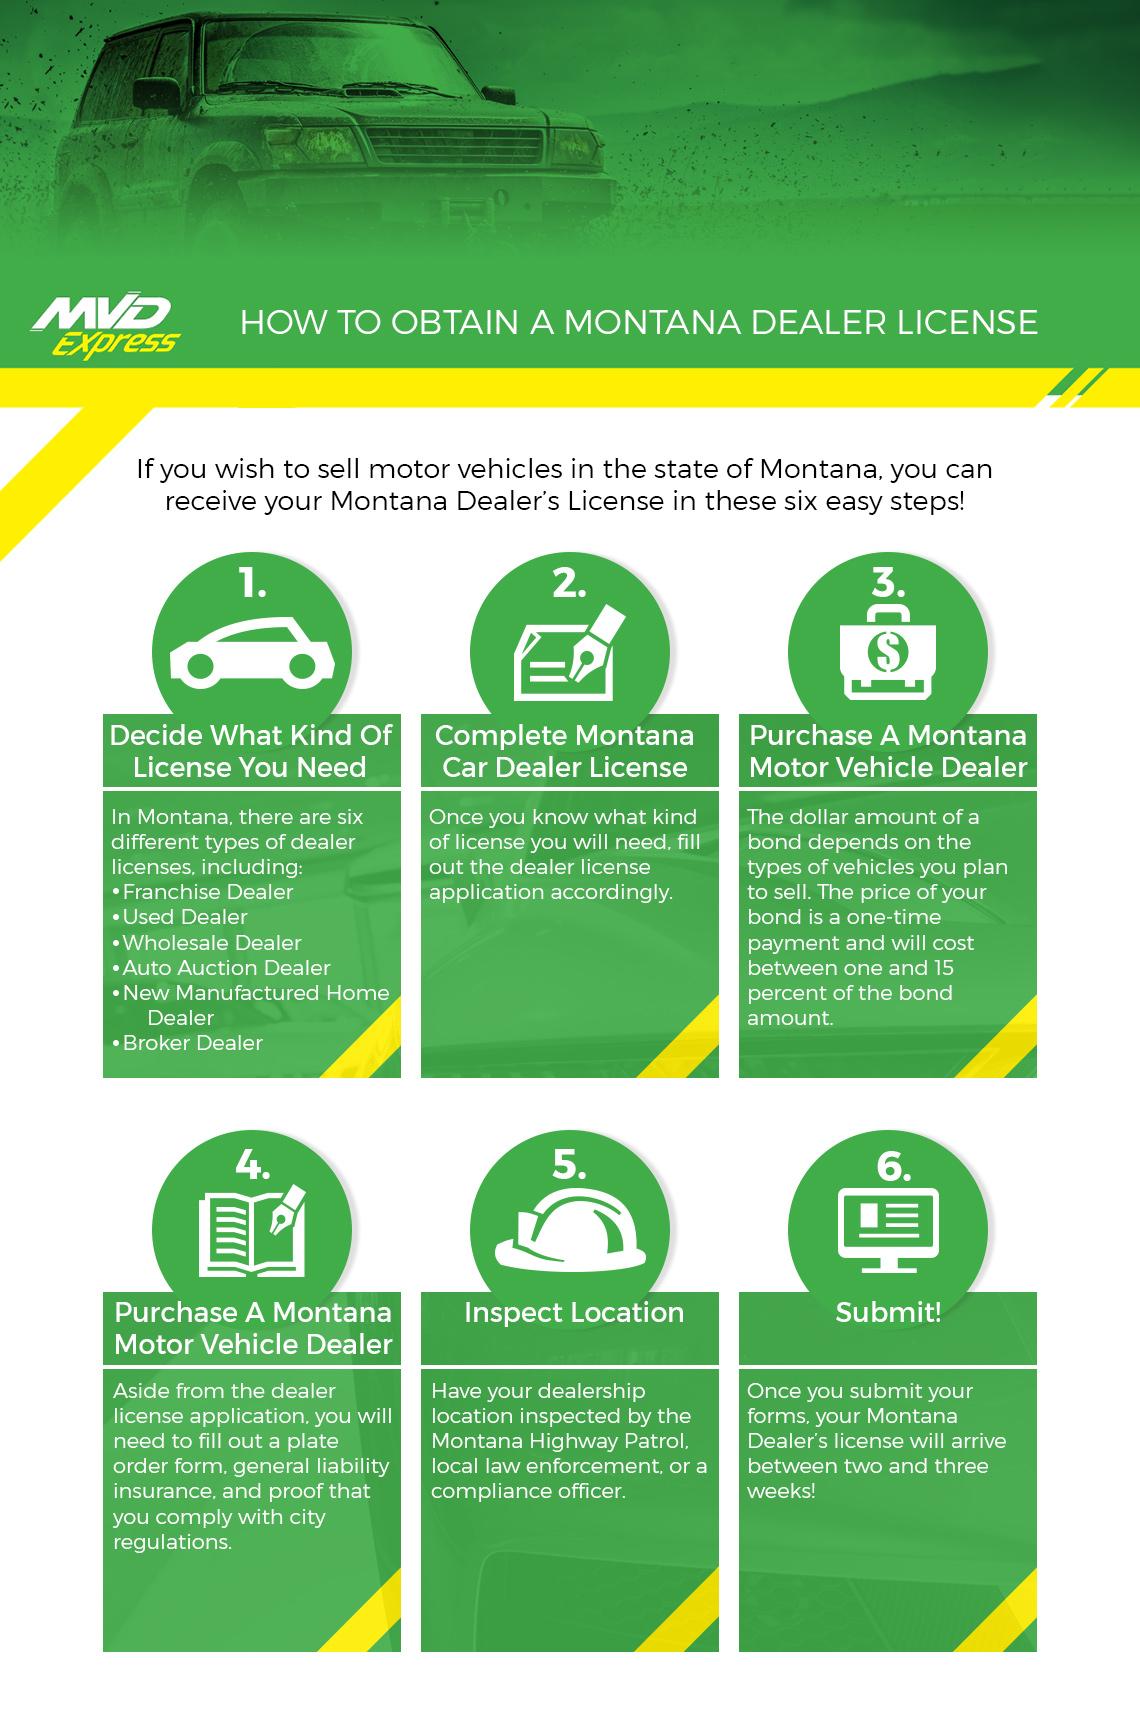 Motor Vehicle Services Billings - Obtaining A Dealer License